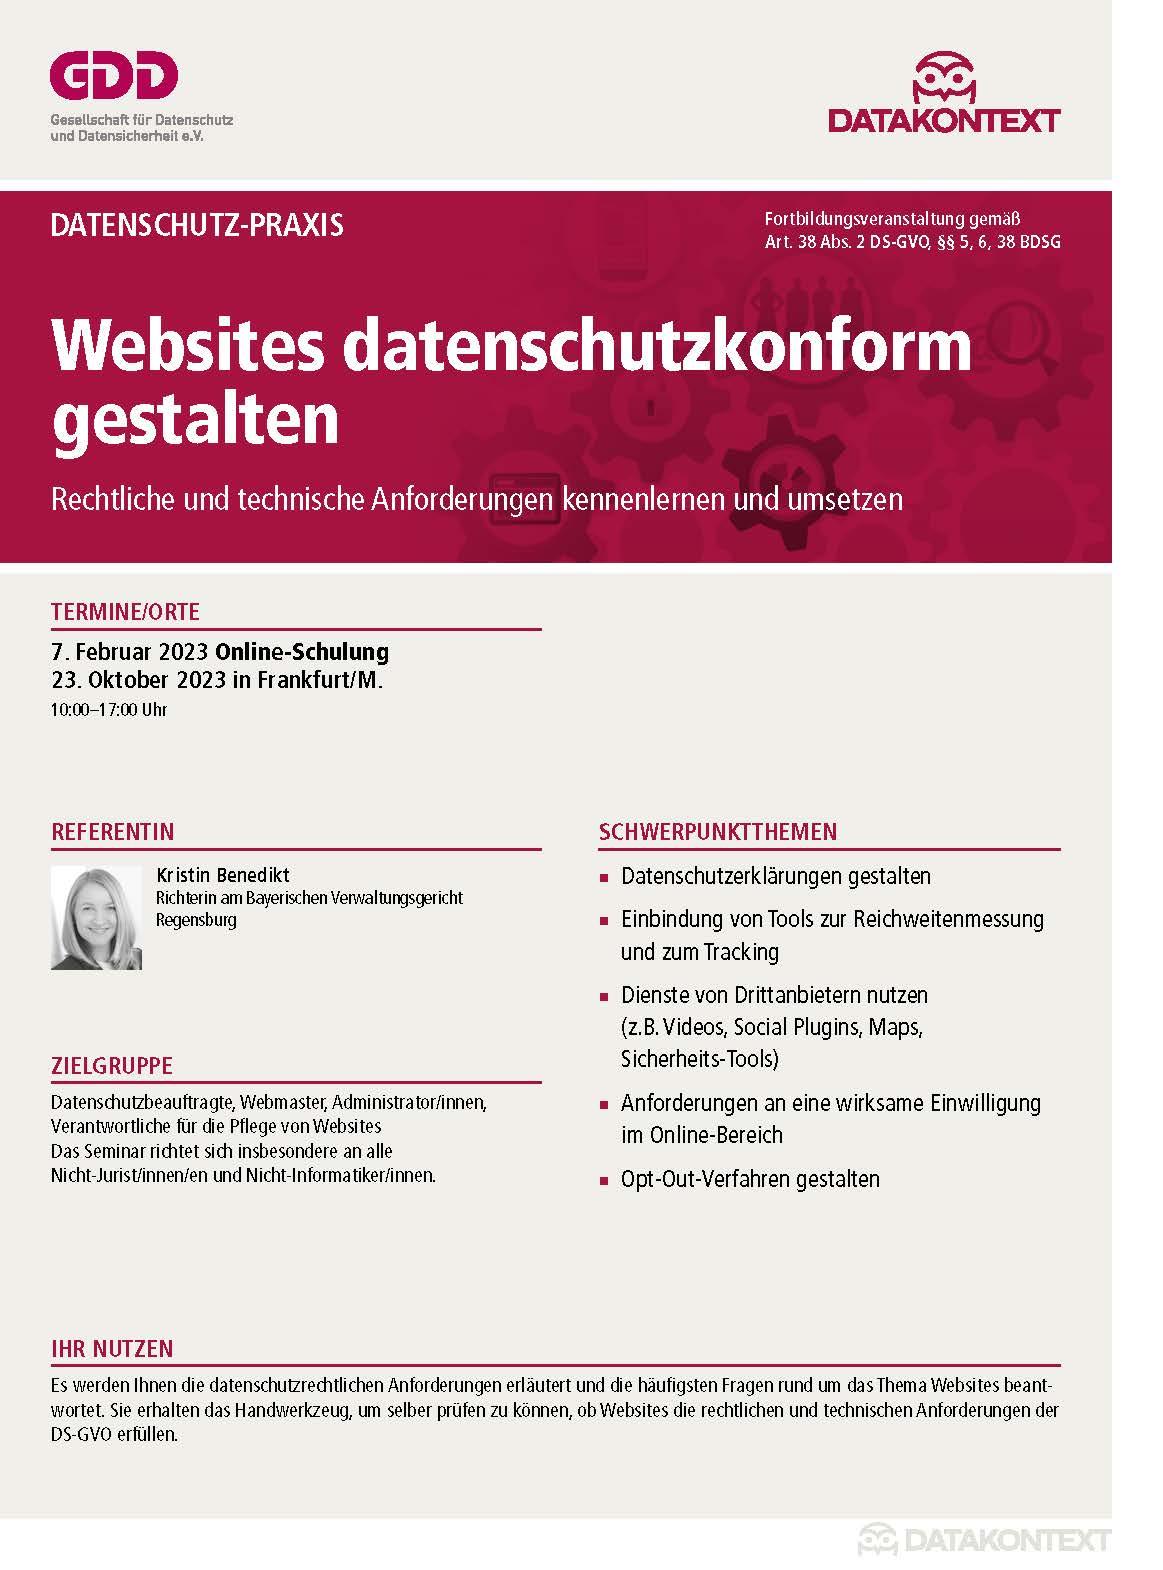 Websites datenschutzkonform gestalten